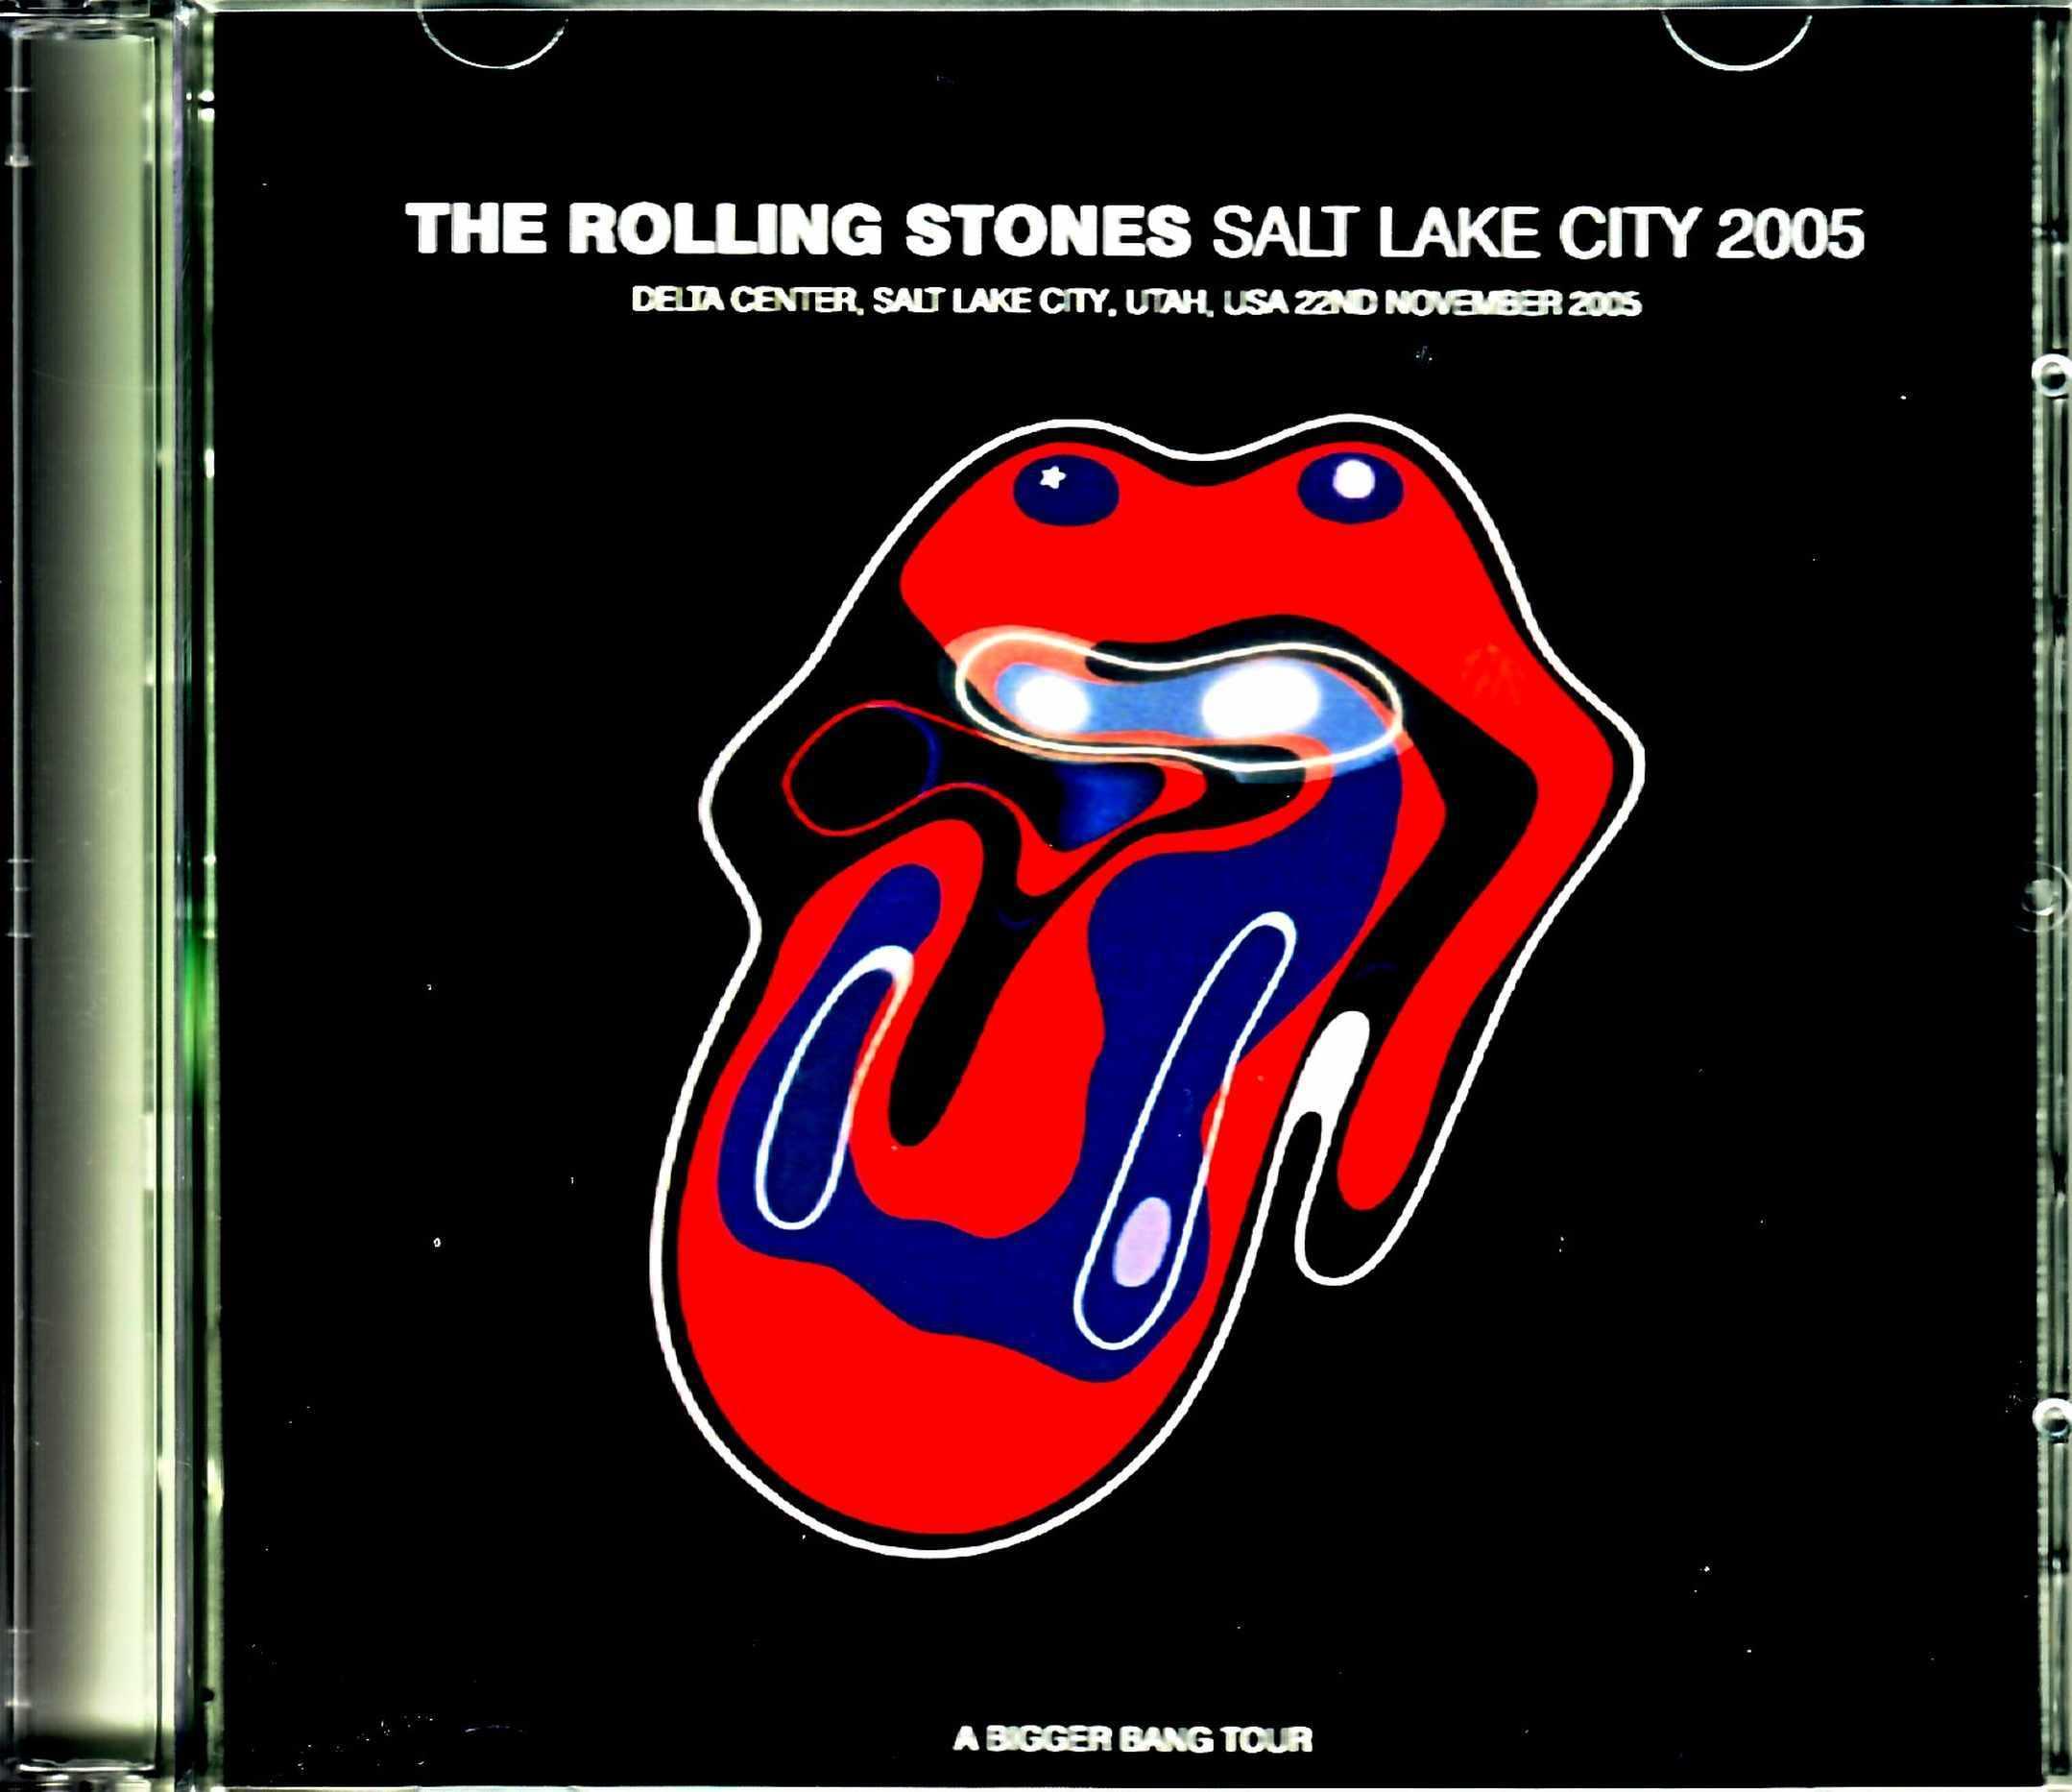 Rolling Stones ローリング・ストーンズ/Utah,USA 2005